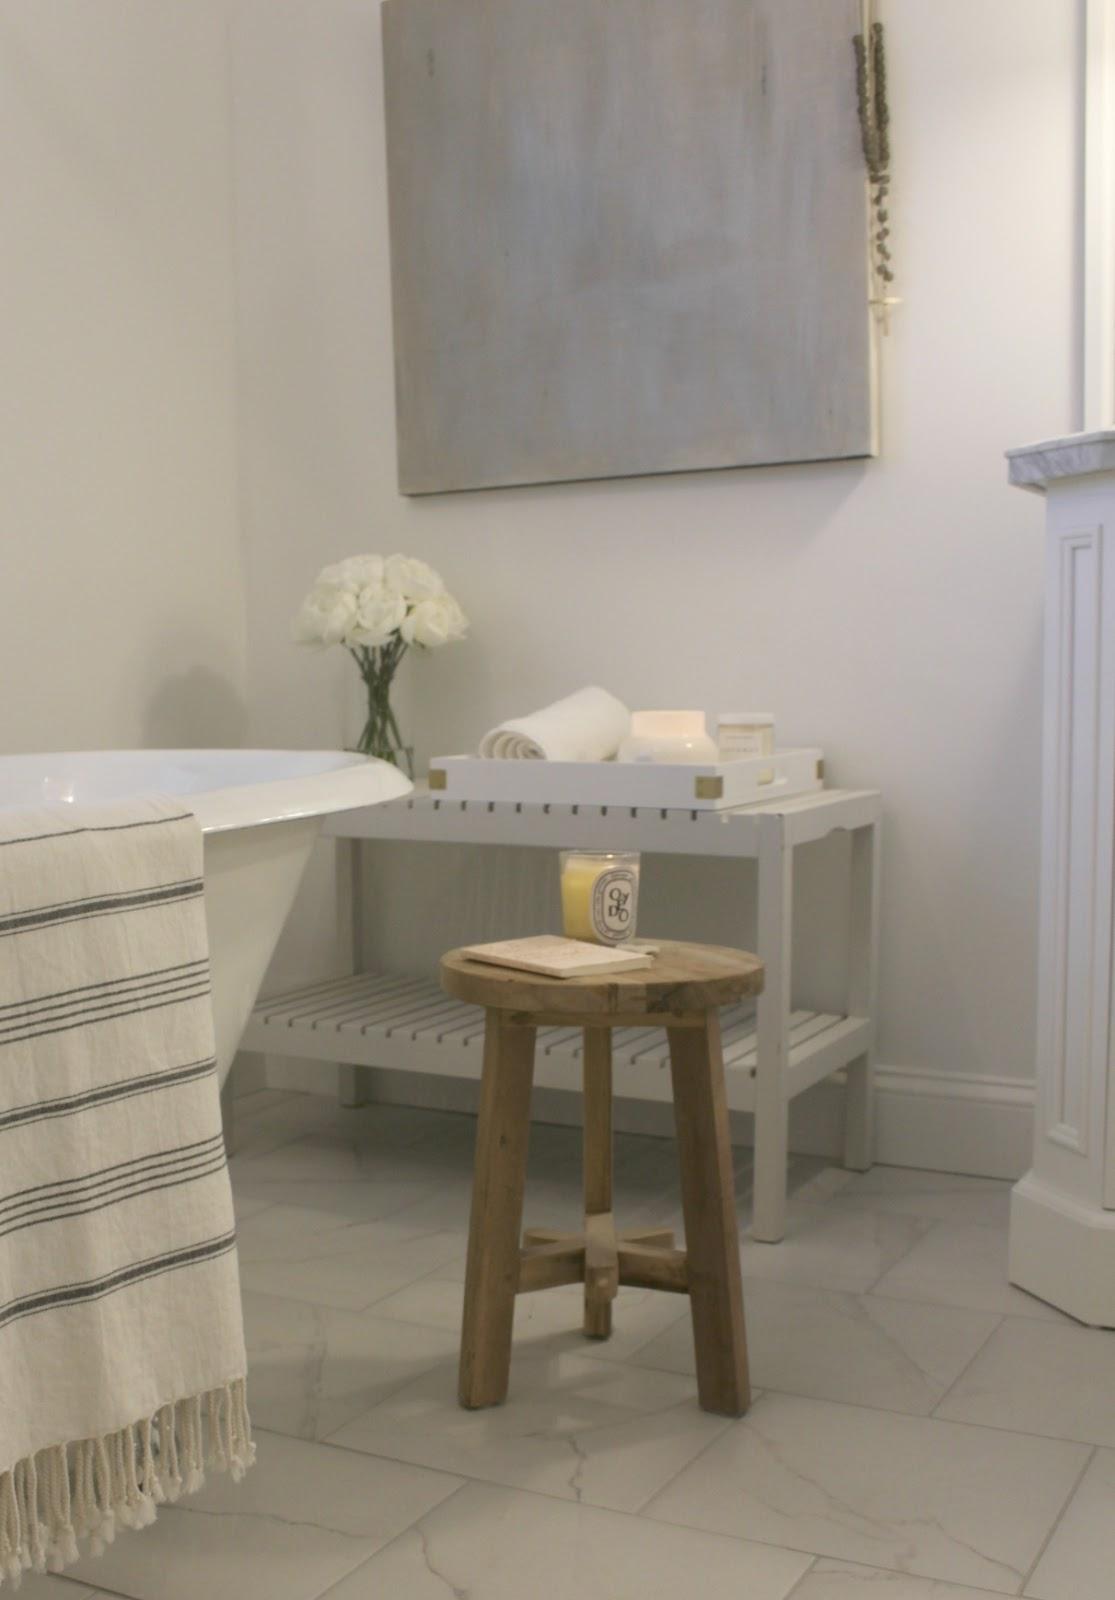 Romantic modern farmhouse interior design style bathroom by Hello Lovely Studio